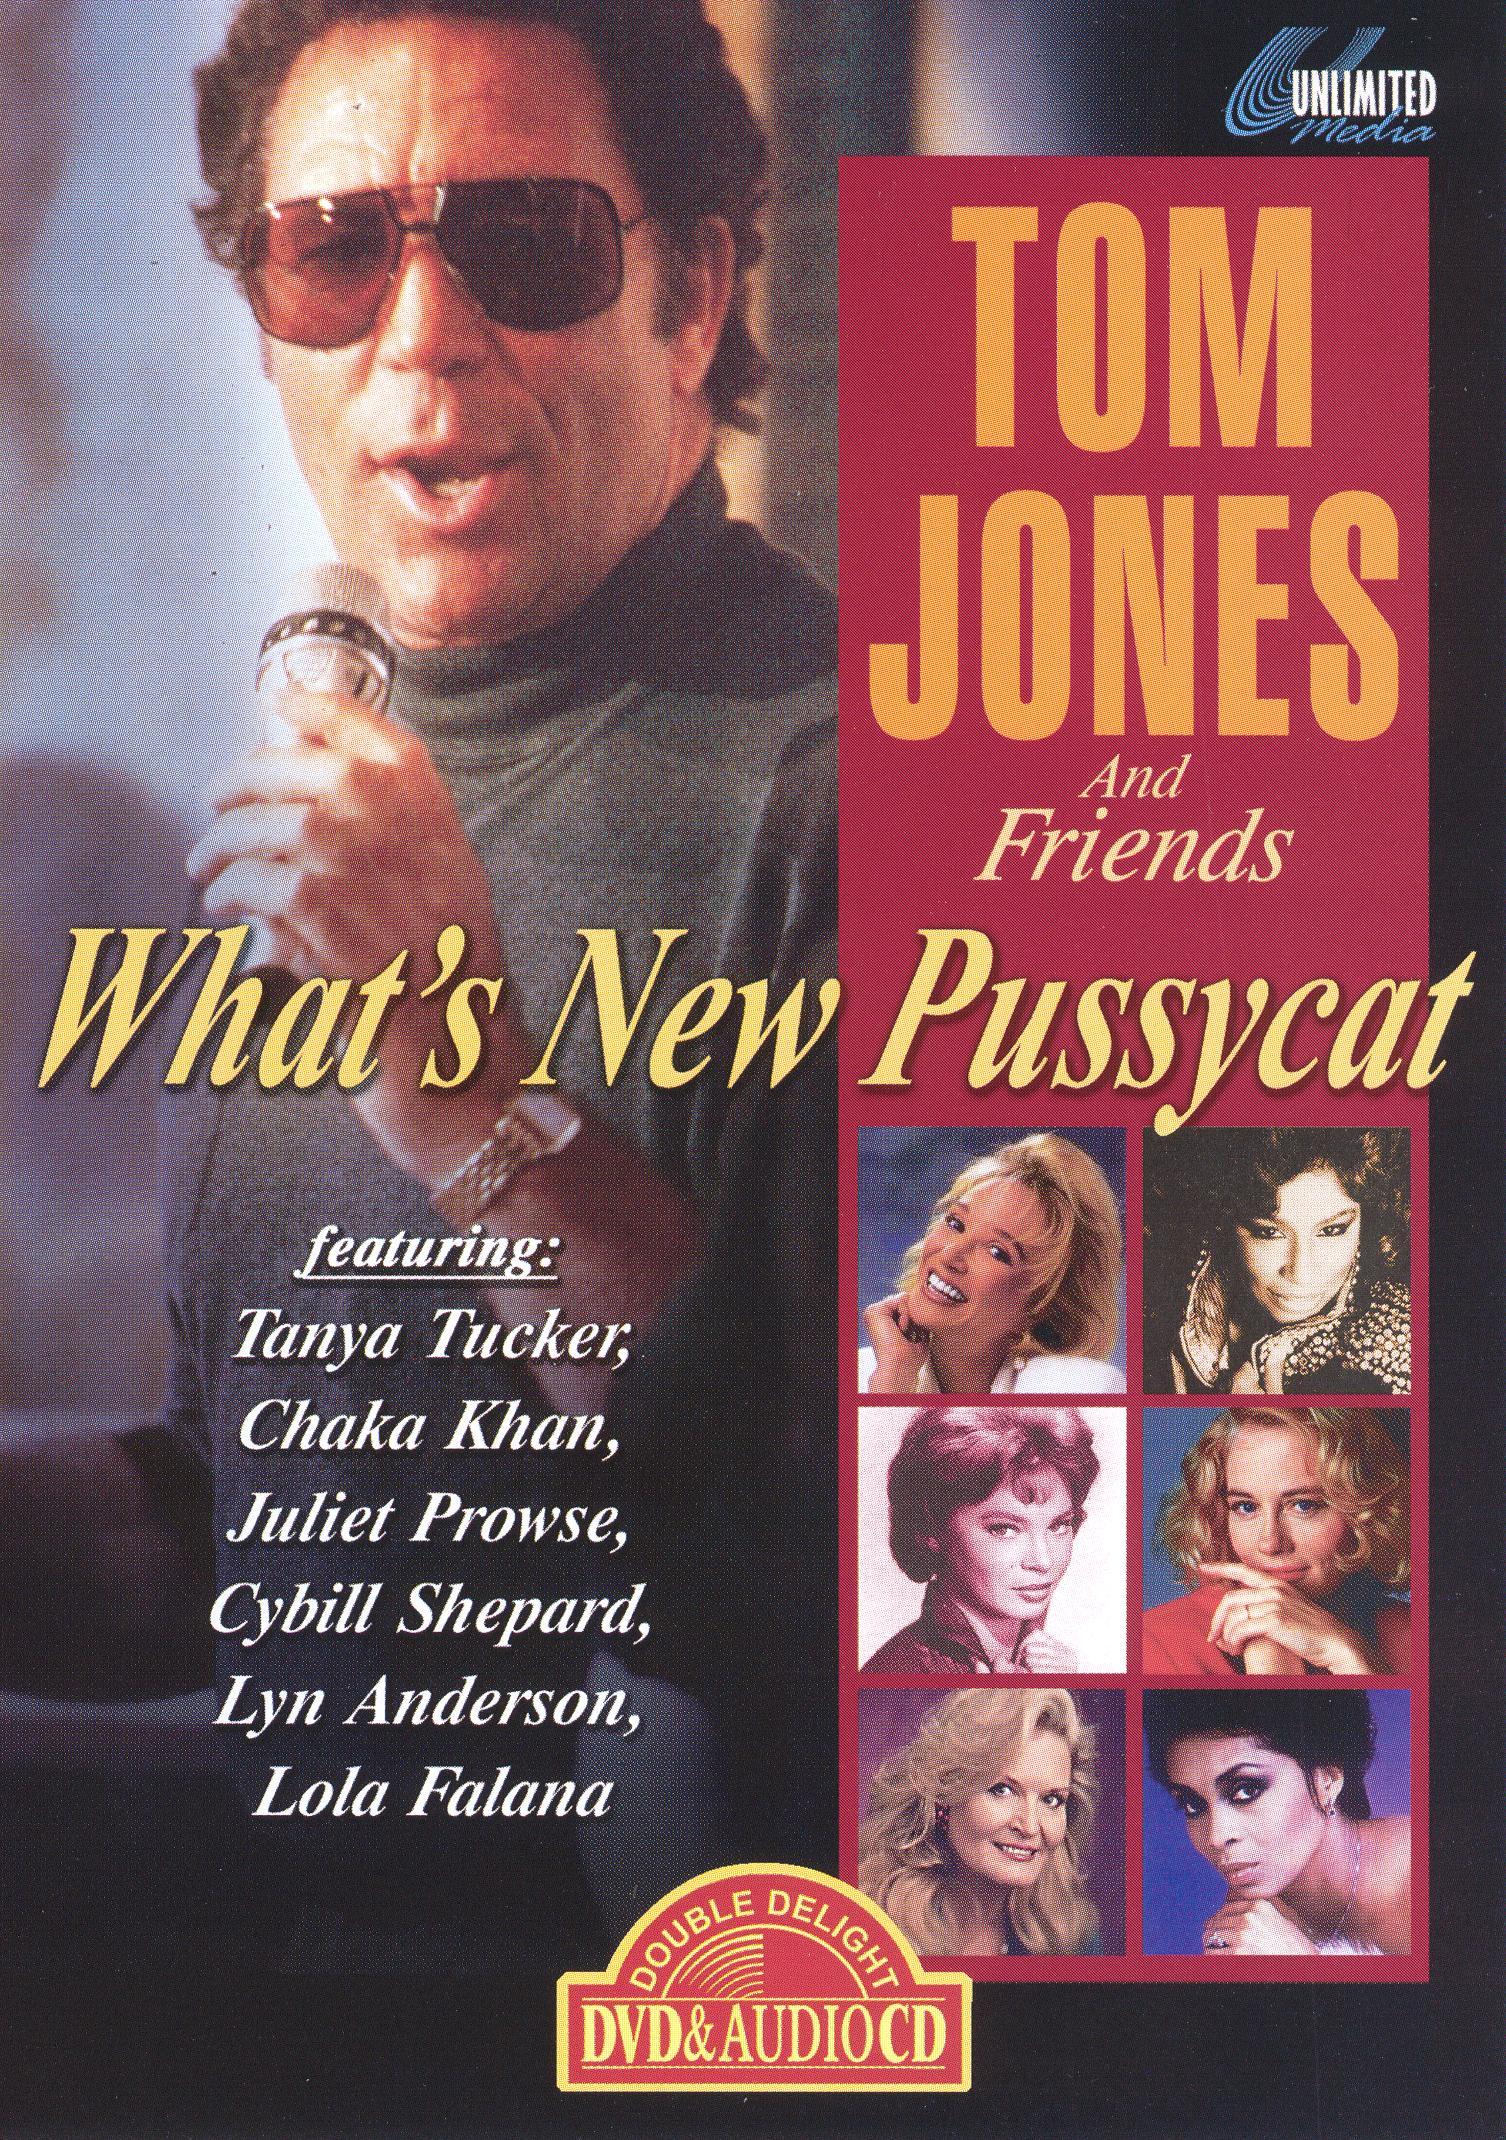 Tom Jones, Vol. 4: What's New Pussycat